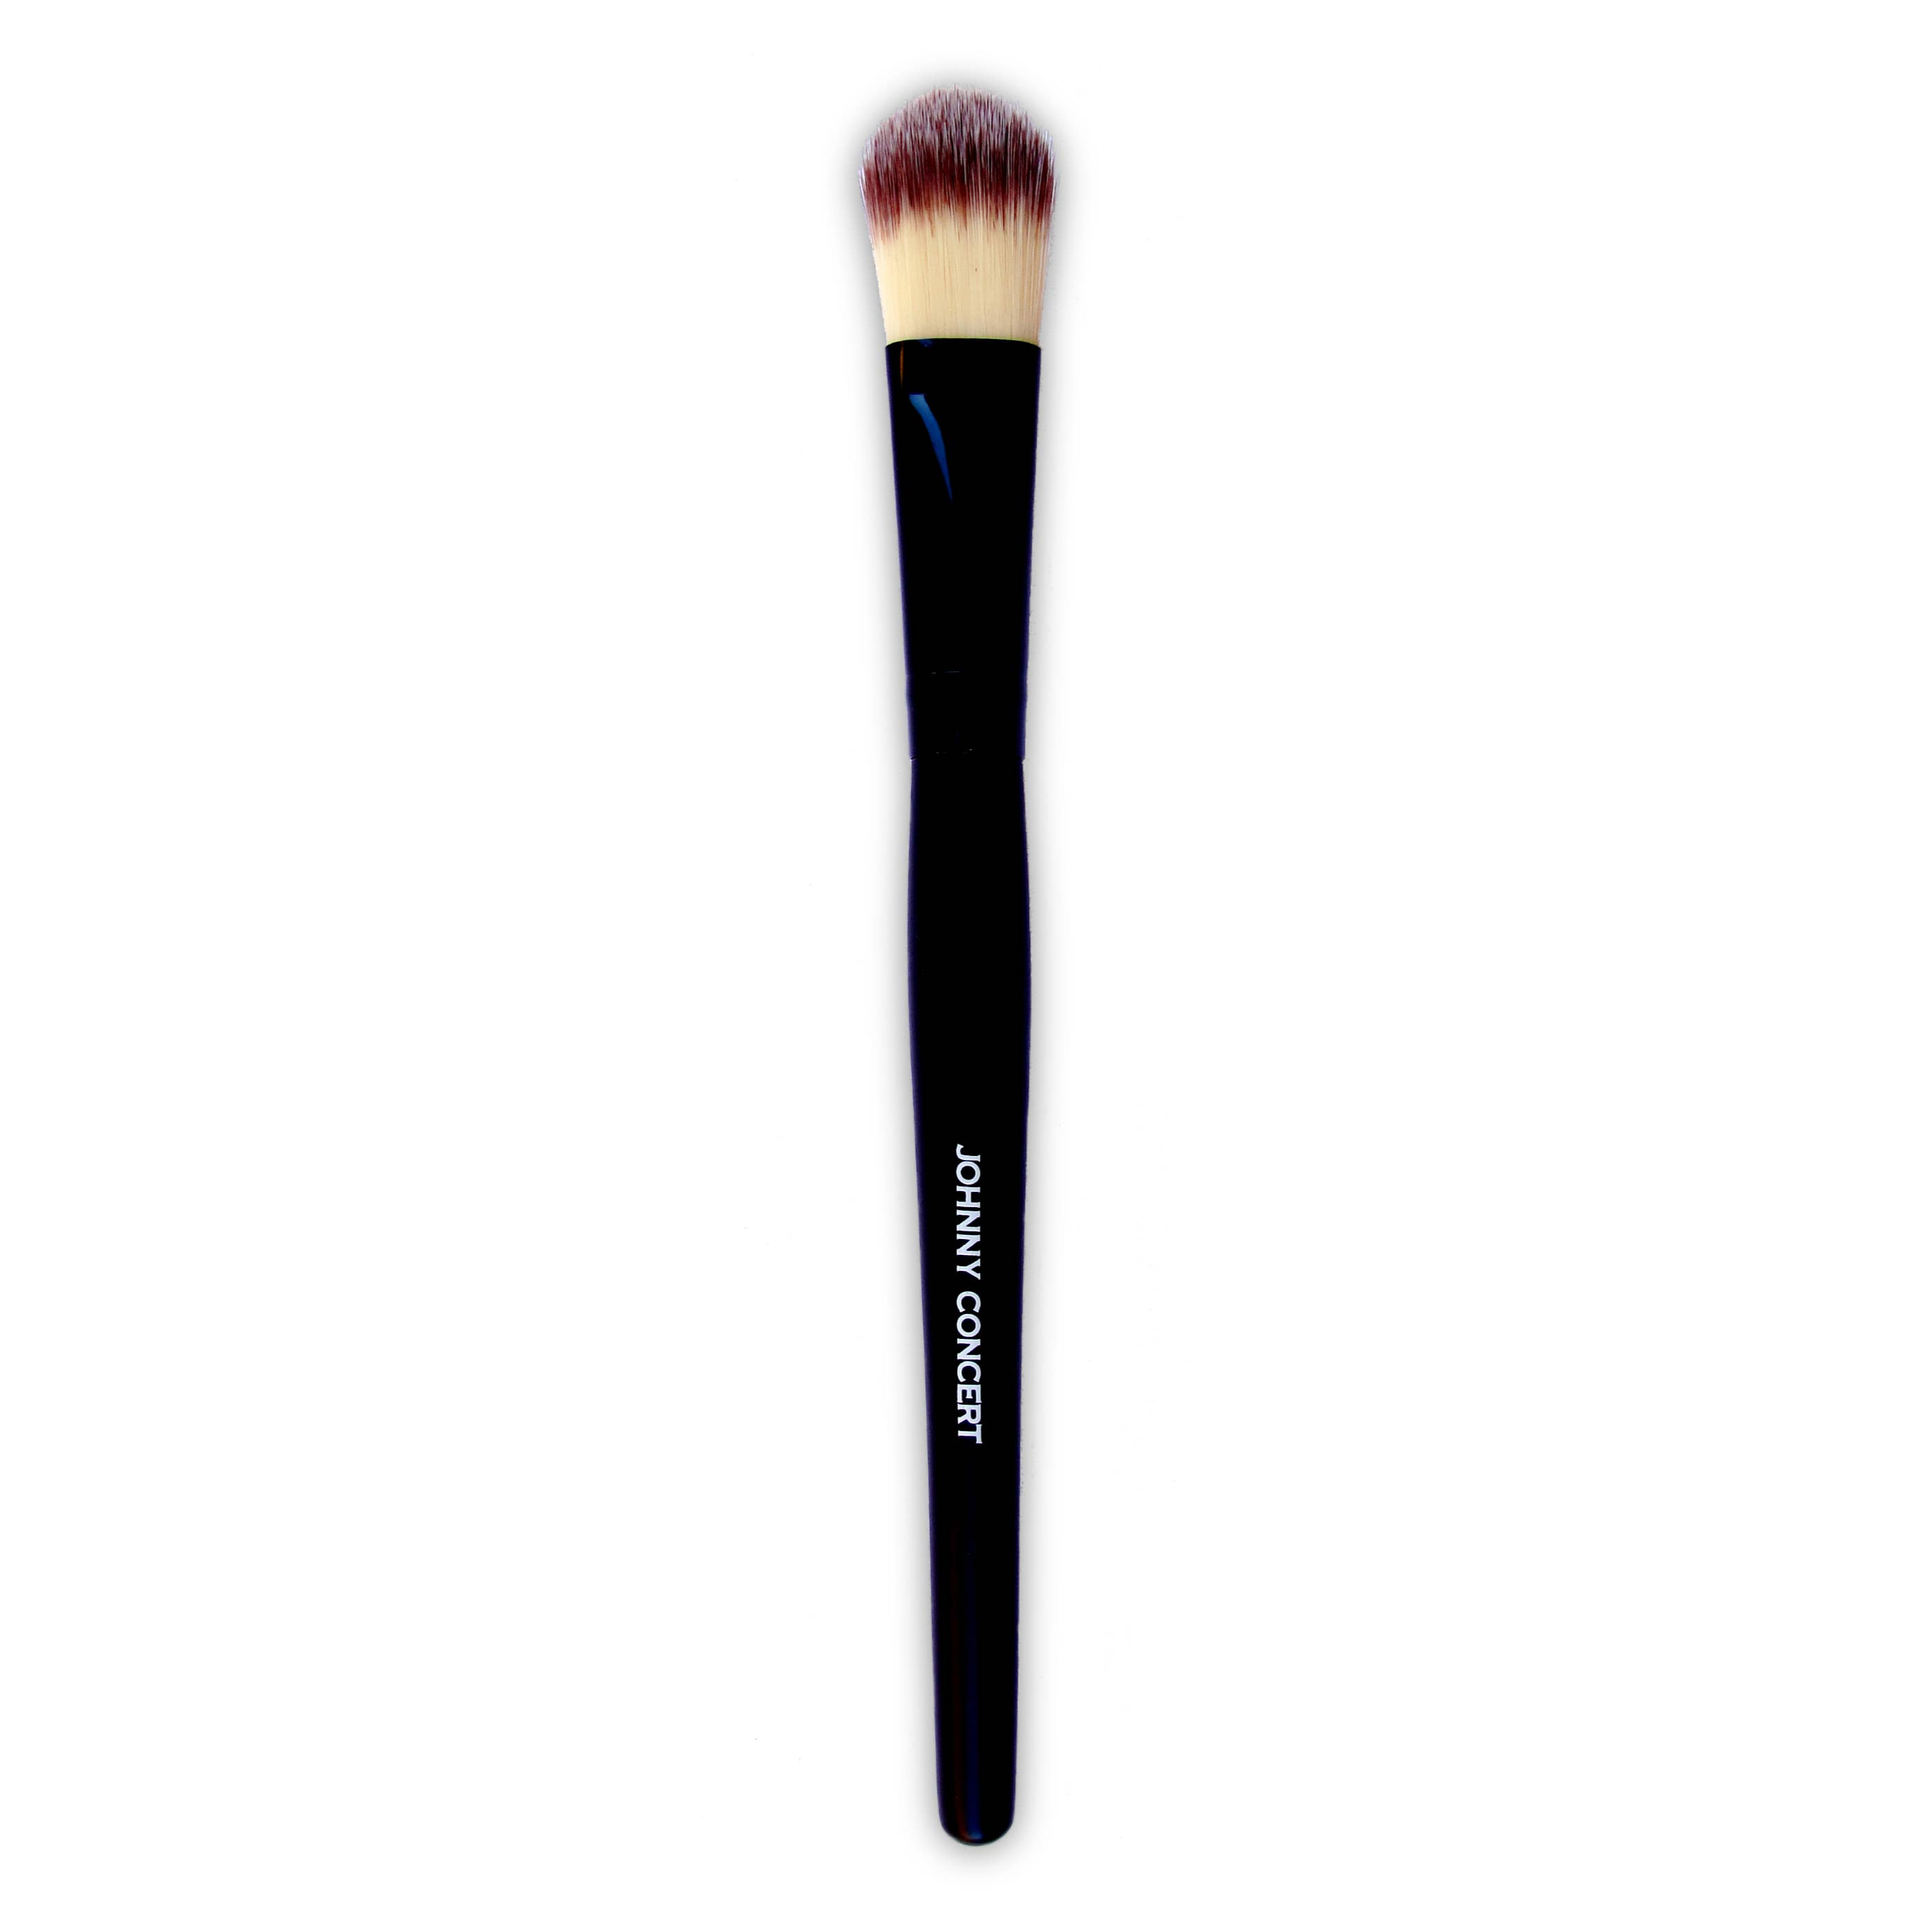 DRIPS - Highlighting Brush | Trada Marketplace